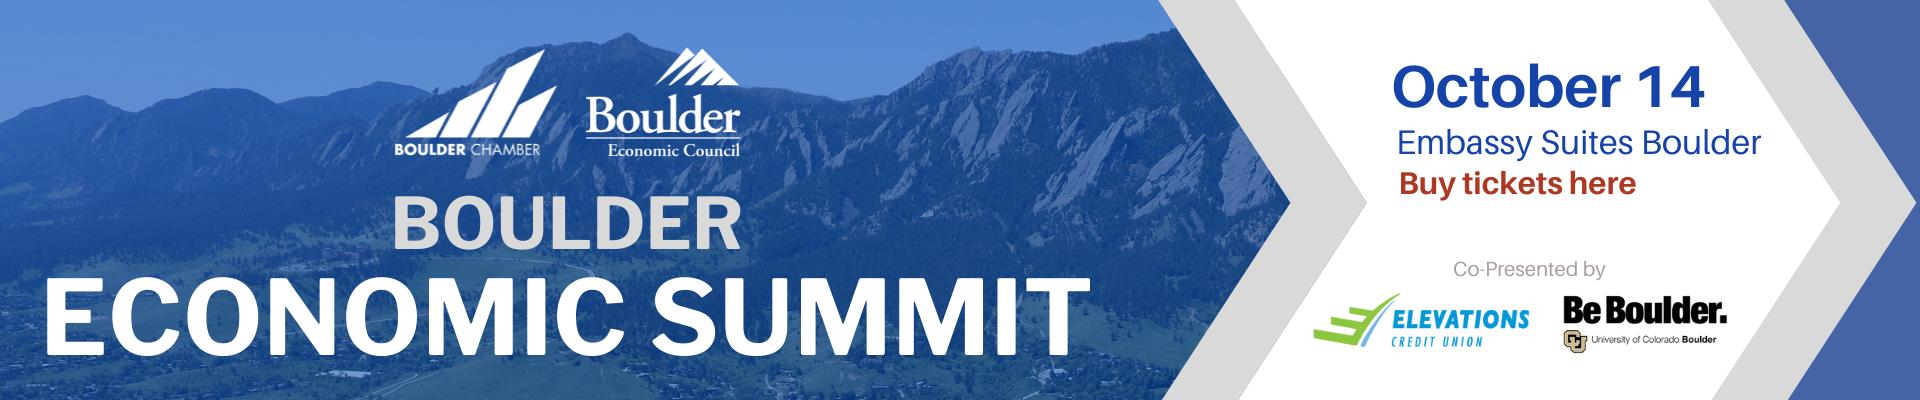 Boulder Economic Summit